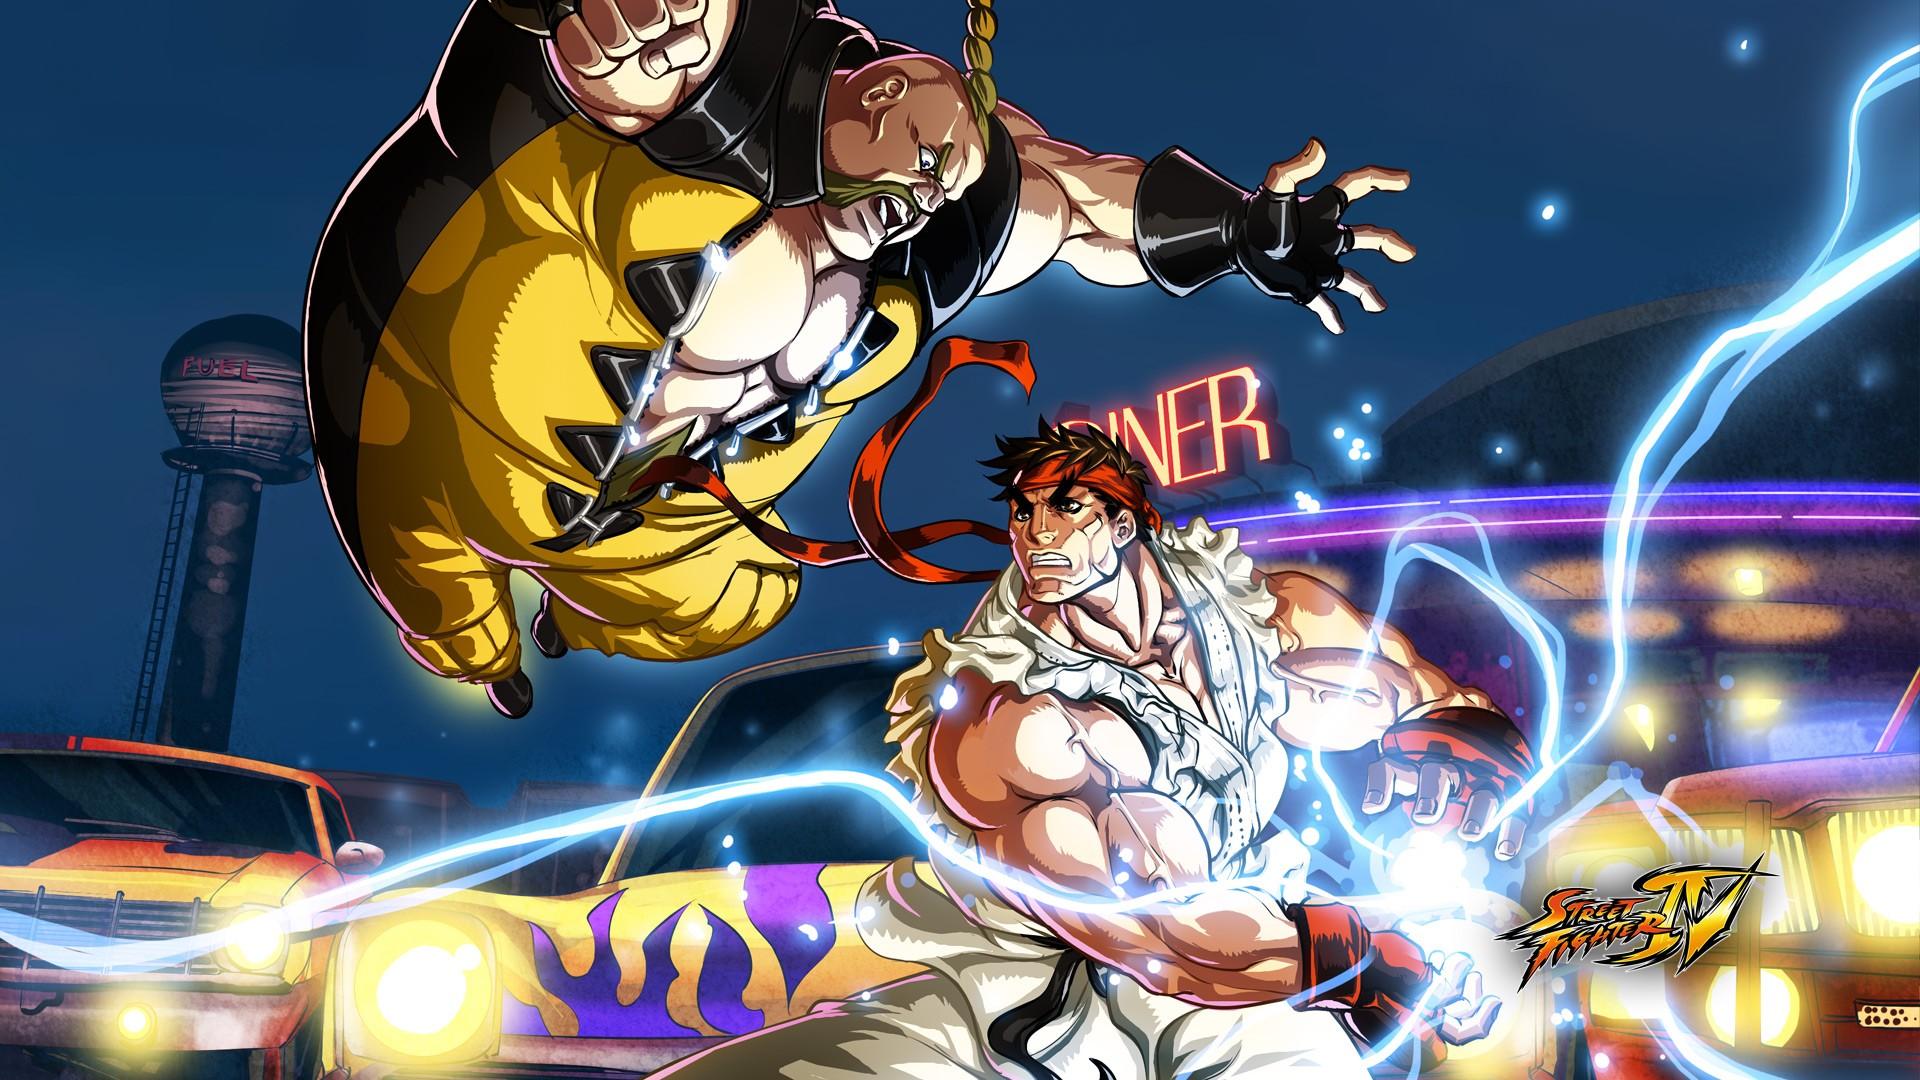 Wallpaper : video games, anime, artwork, cartoon, Street